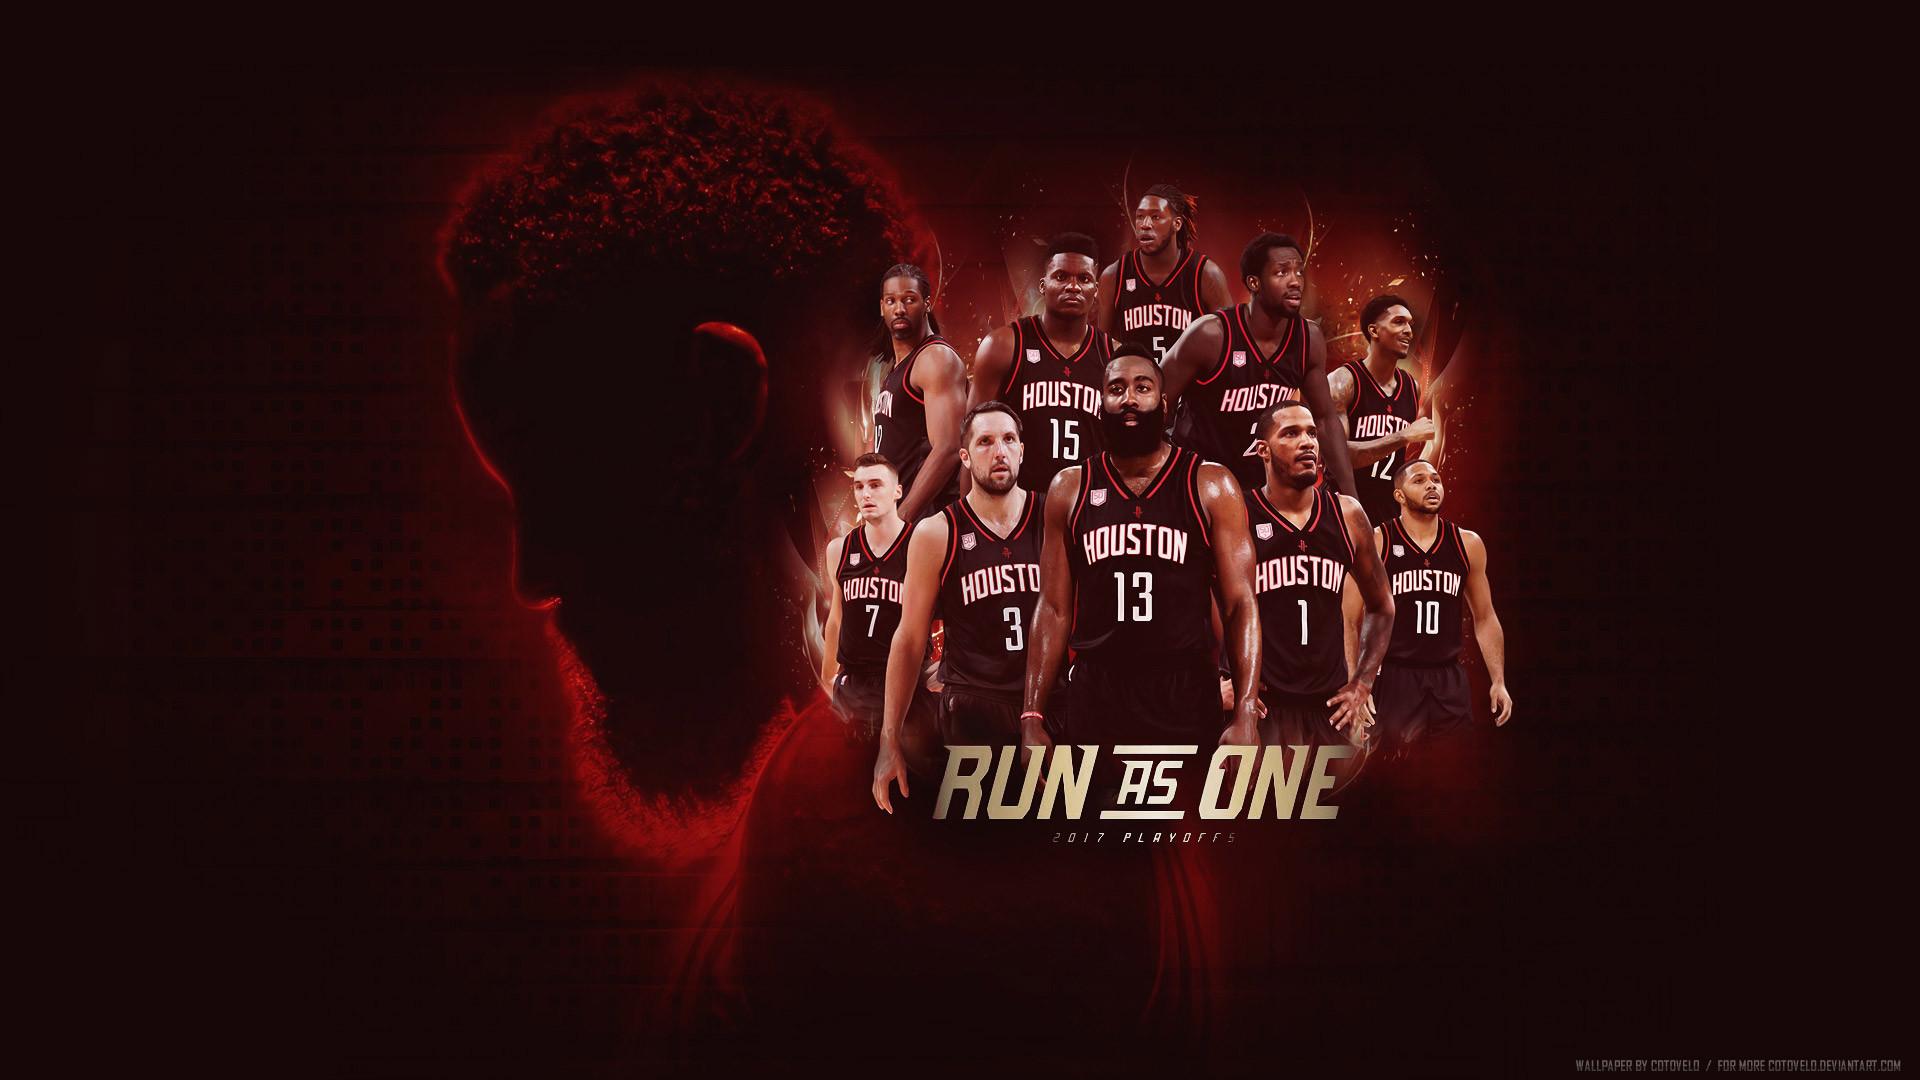 Houston Rockets 2017 Wallpaper